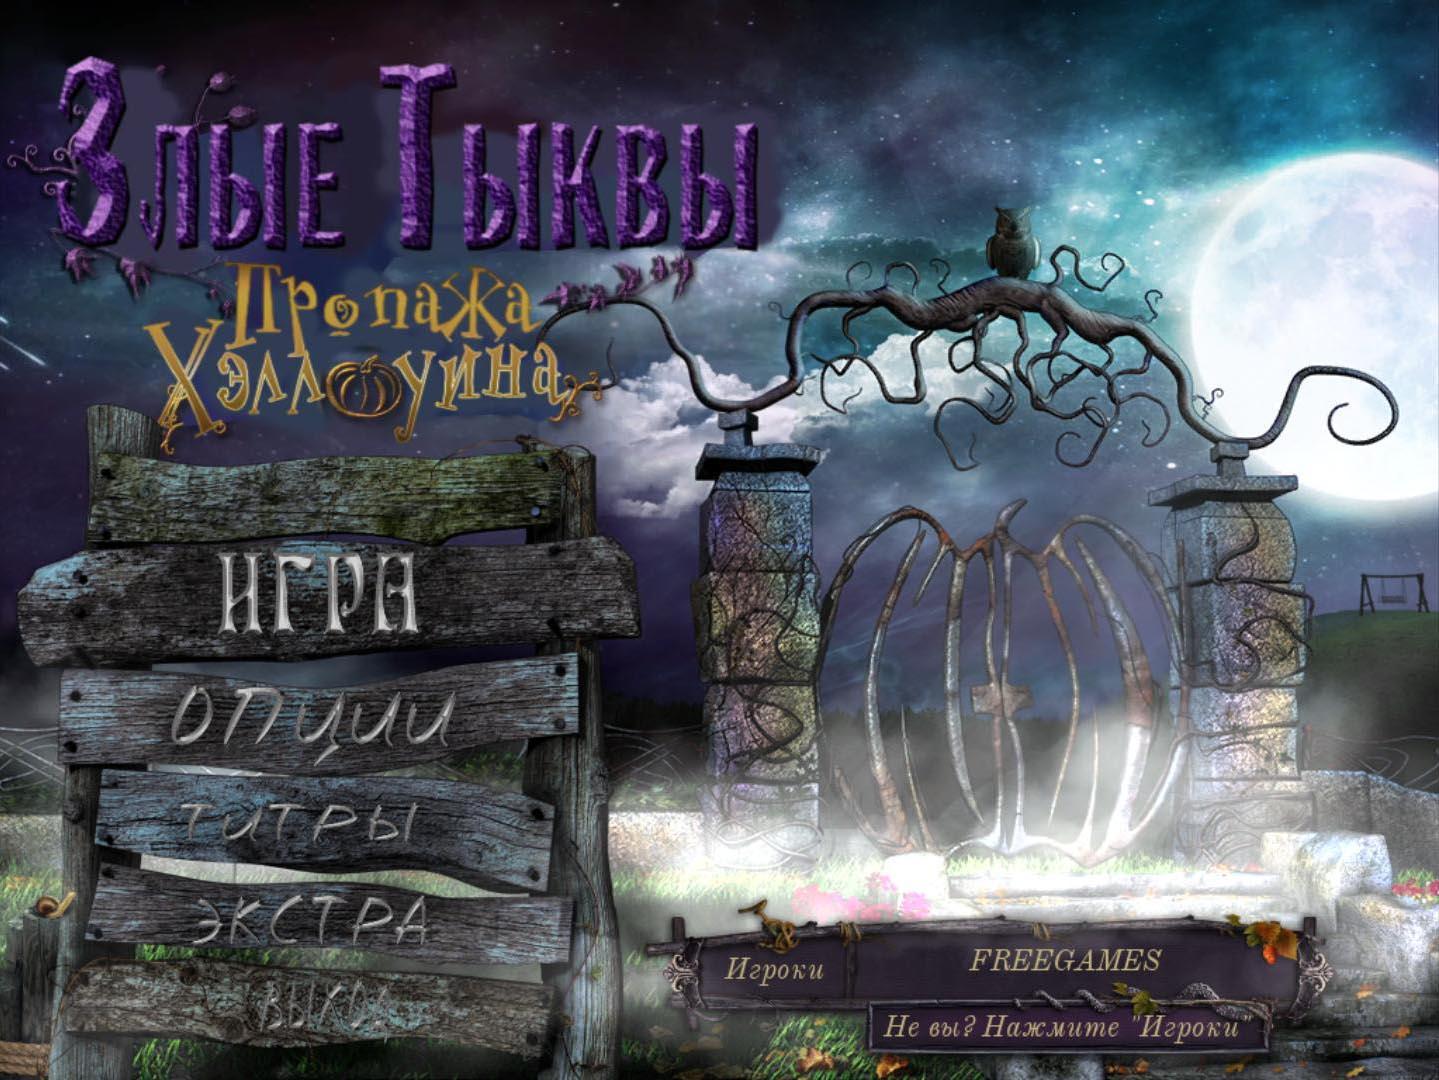 Злые тыквы: Пропажа Хэллоуина | Evil Pumpkin: The Lost Halloween (Rus)